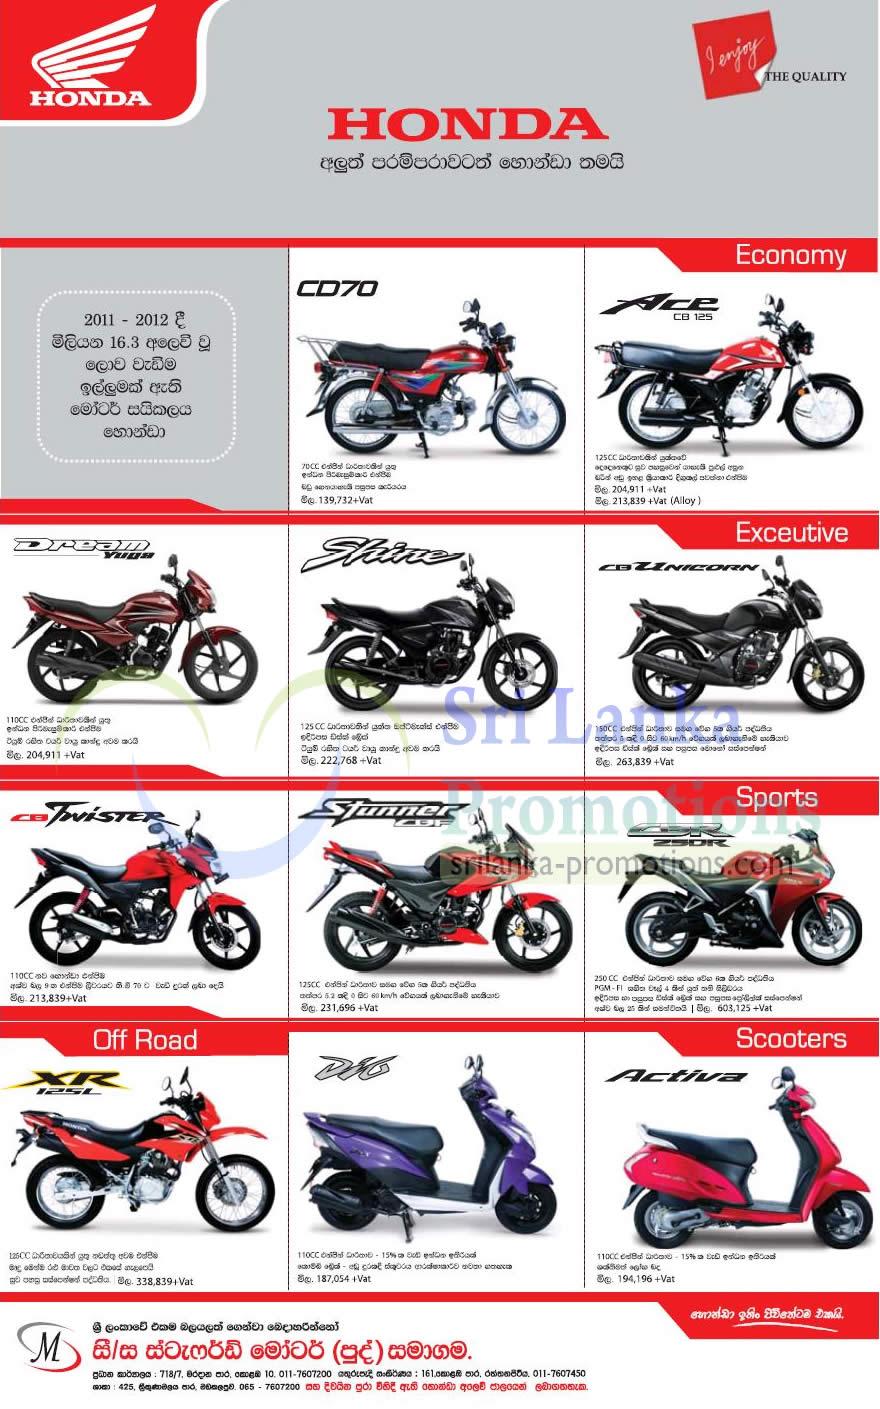 Honda 25 Mar 2013 187 Honda Motorcycles Amp Scooter Price List